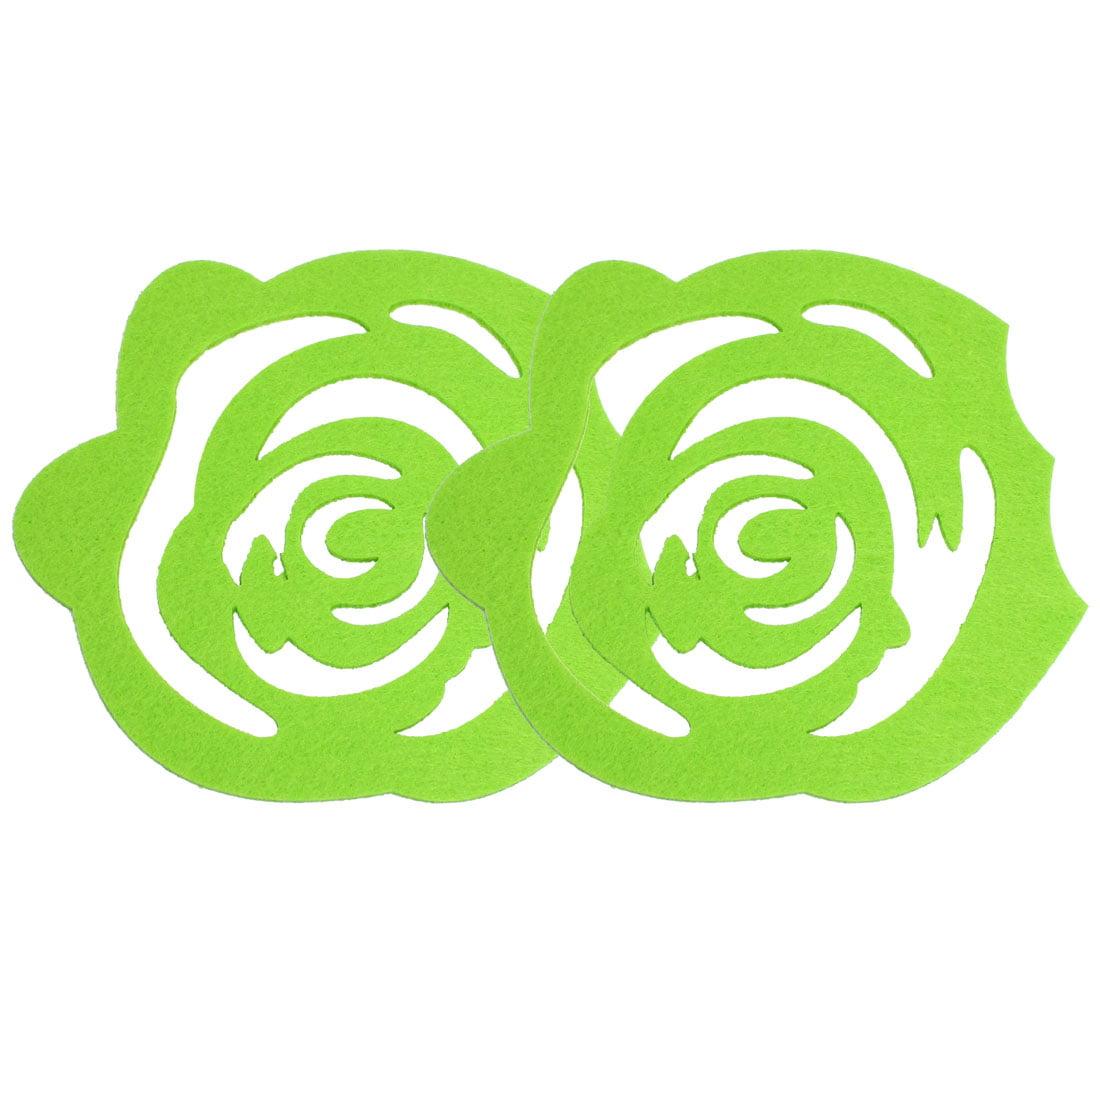 Green Kitchen Cup Heat Insulation Coaster Felt Mat Pad 2 Pcs